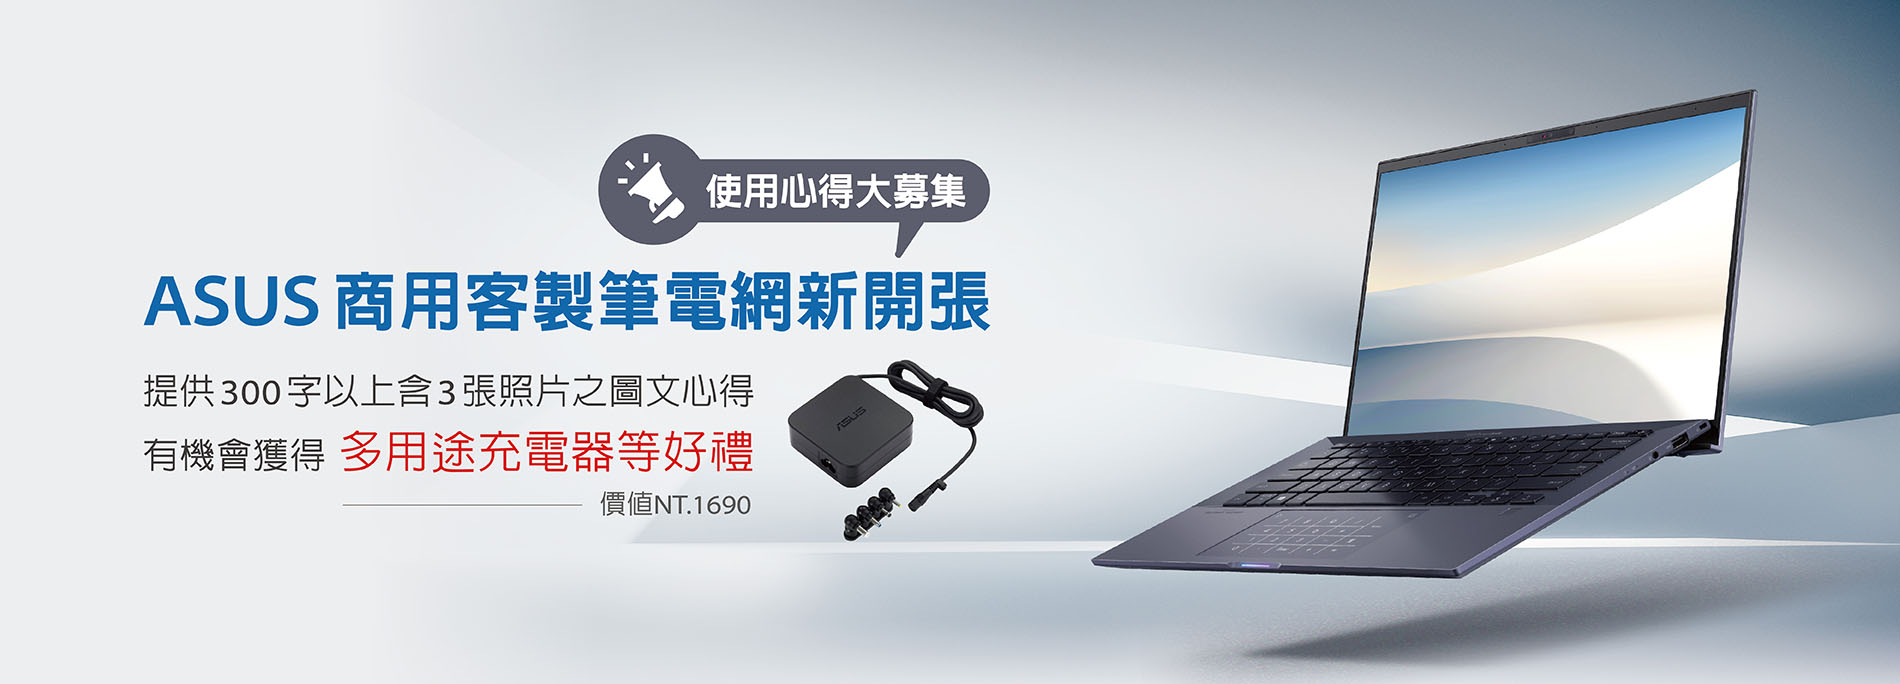 ASUS商用客製筆電網站新開張,使用心得大募集,分享您的購買感想,ASUS 90W多用途筆電充電器送給您